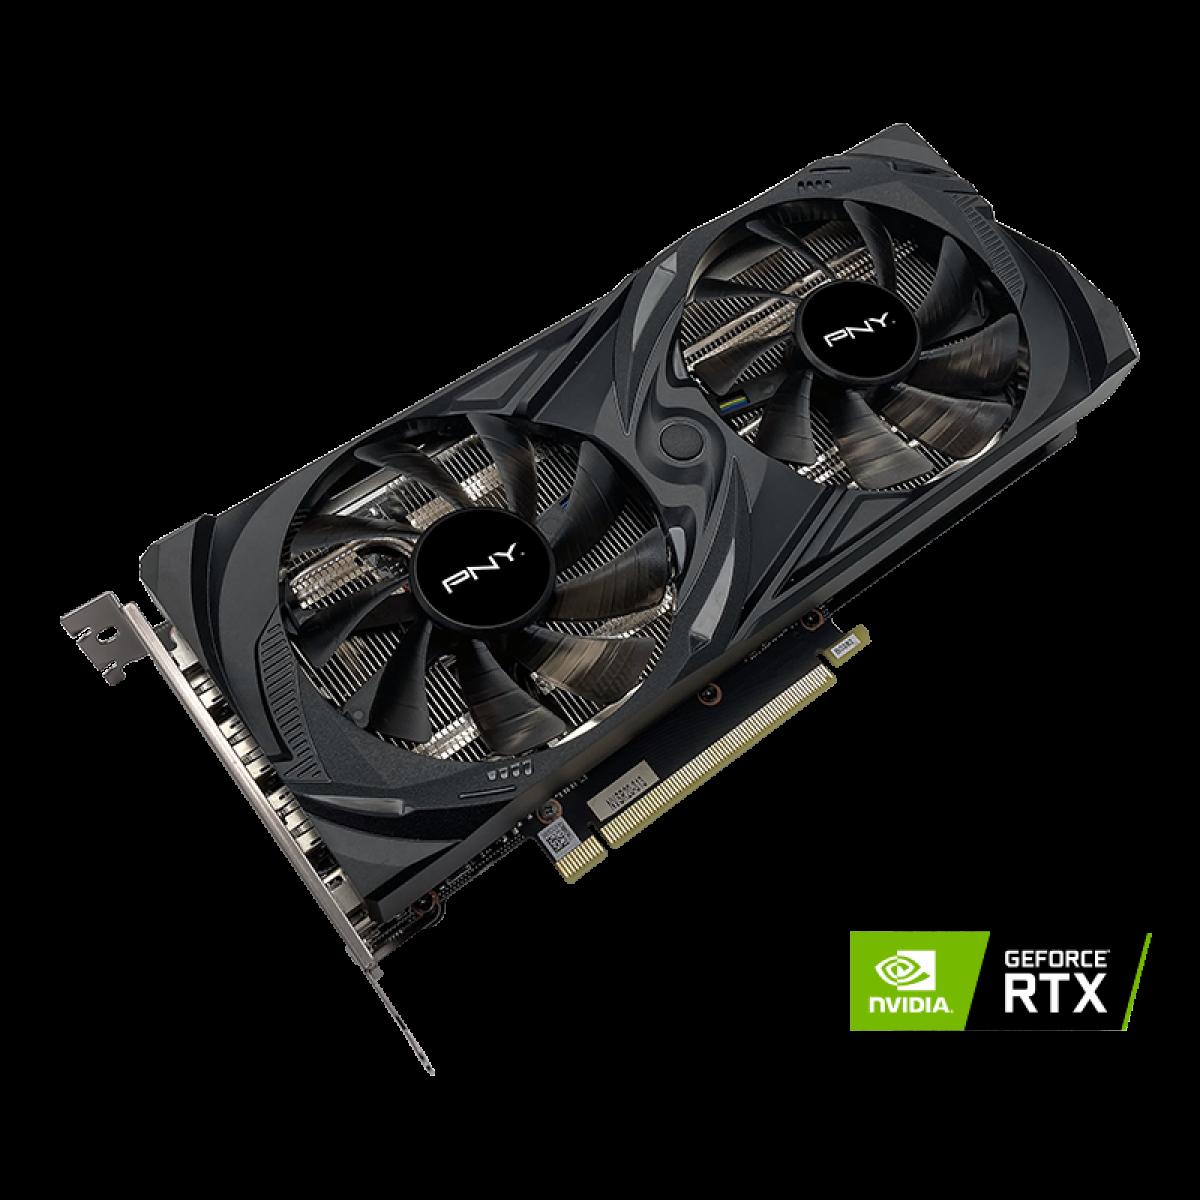 Placa de Vídeo PNY GeForce RTX 3060 Uprising Dual, 12GB, GDDR6, 192bit, VCG306012DFMPB